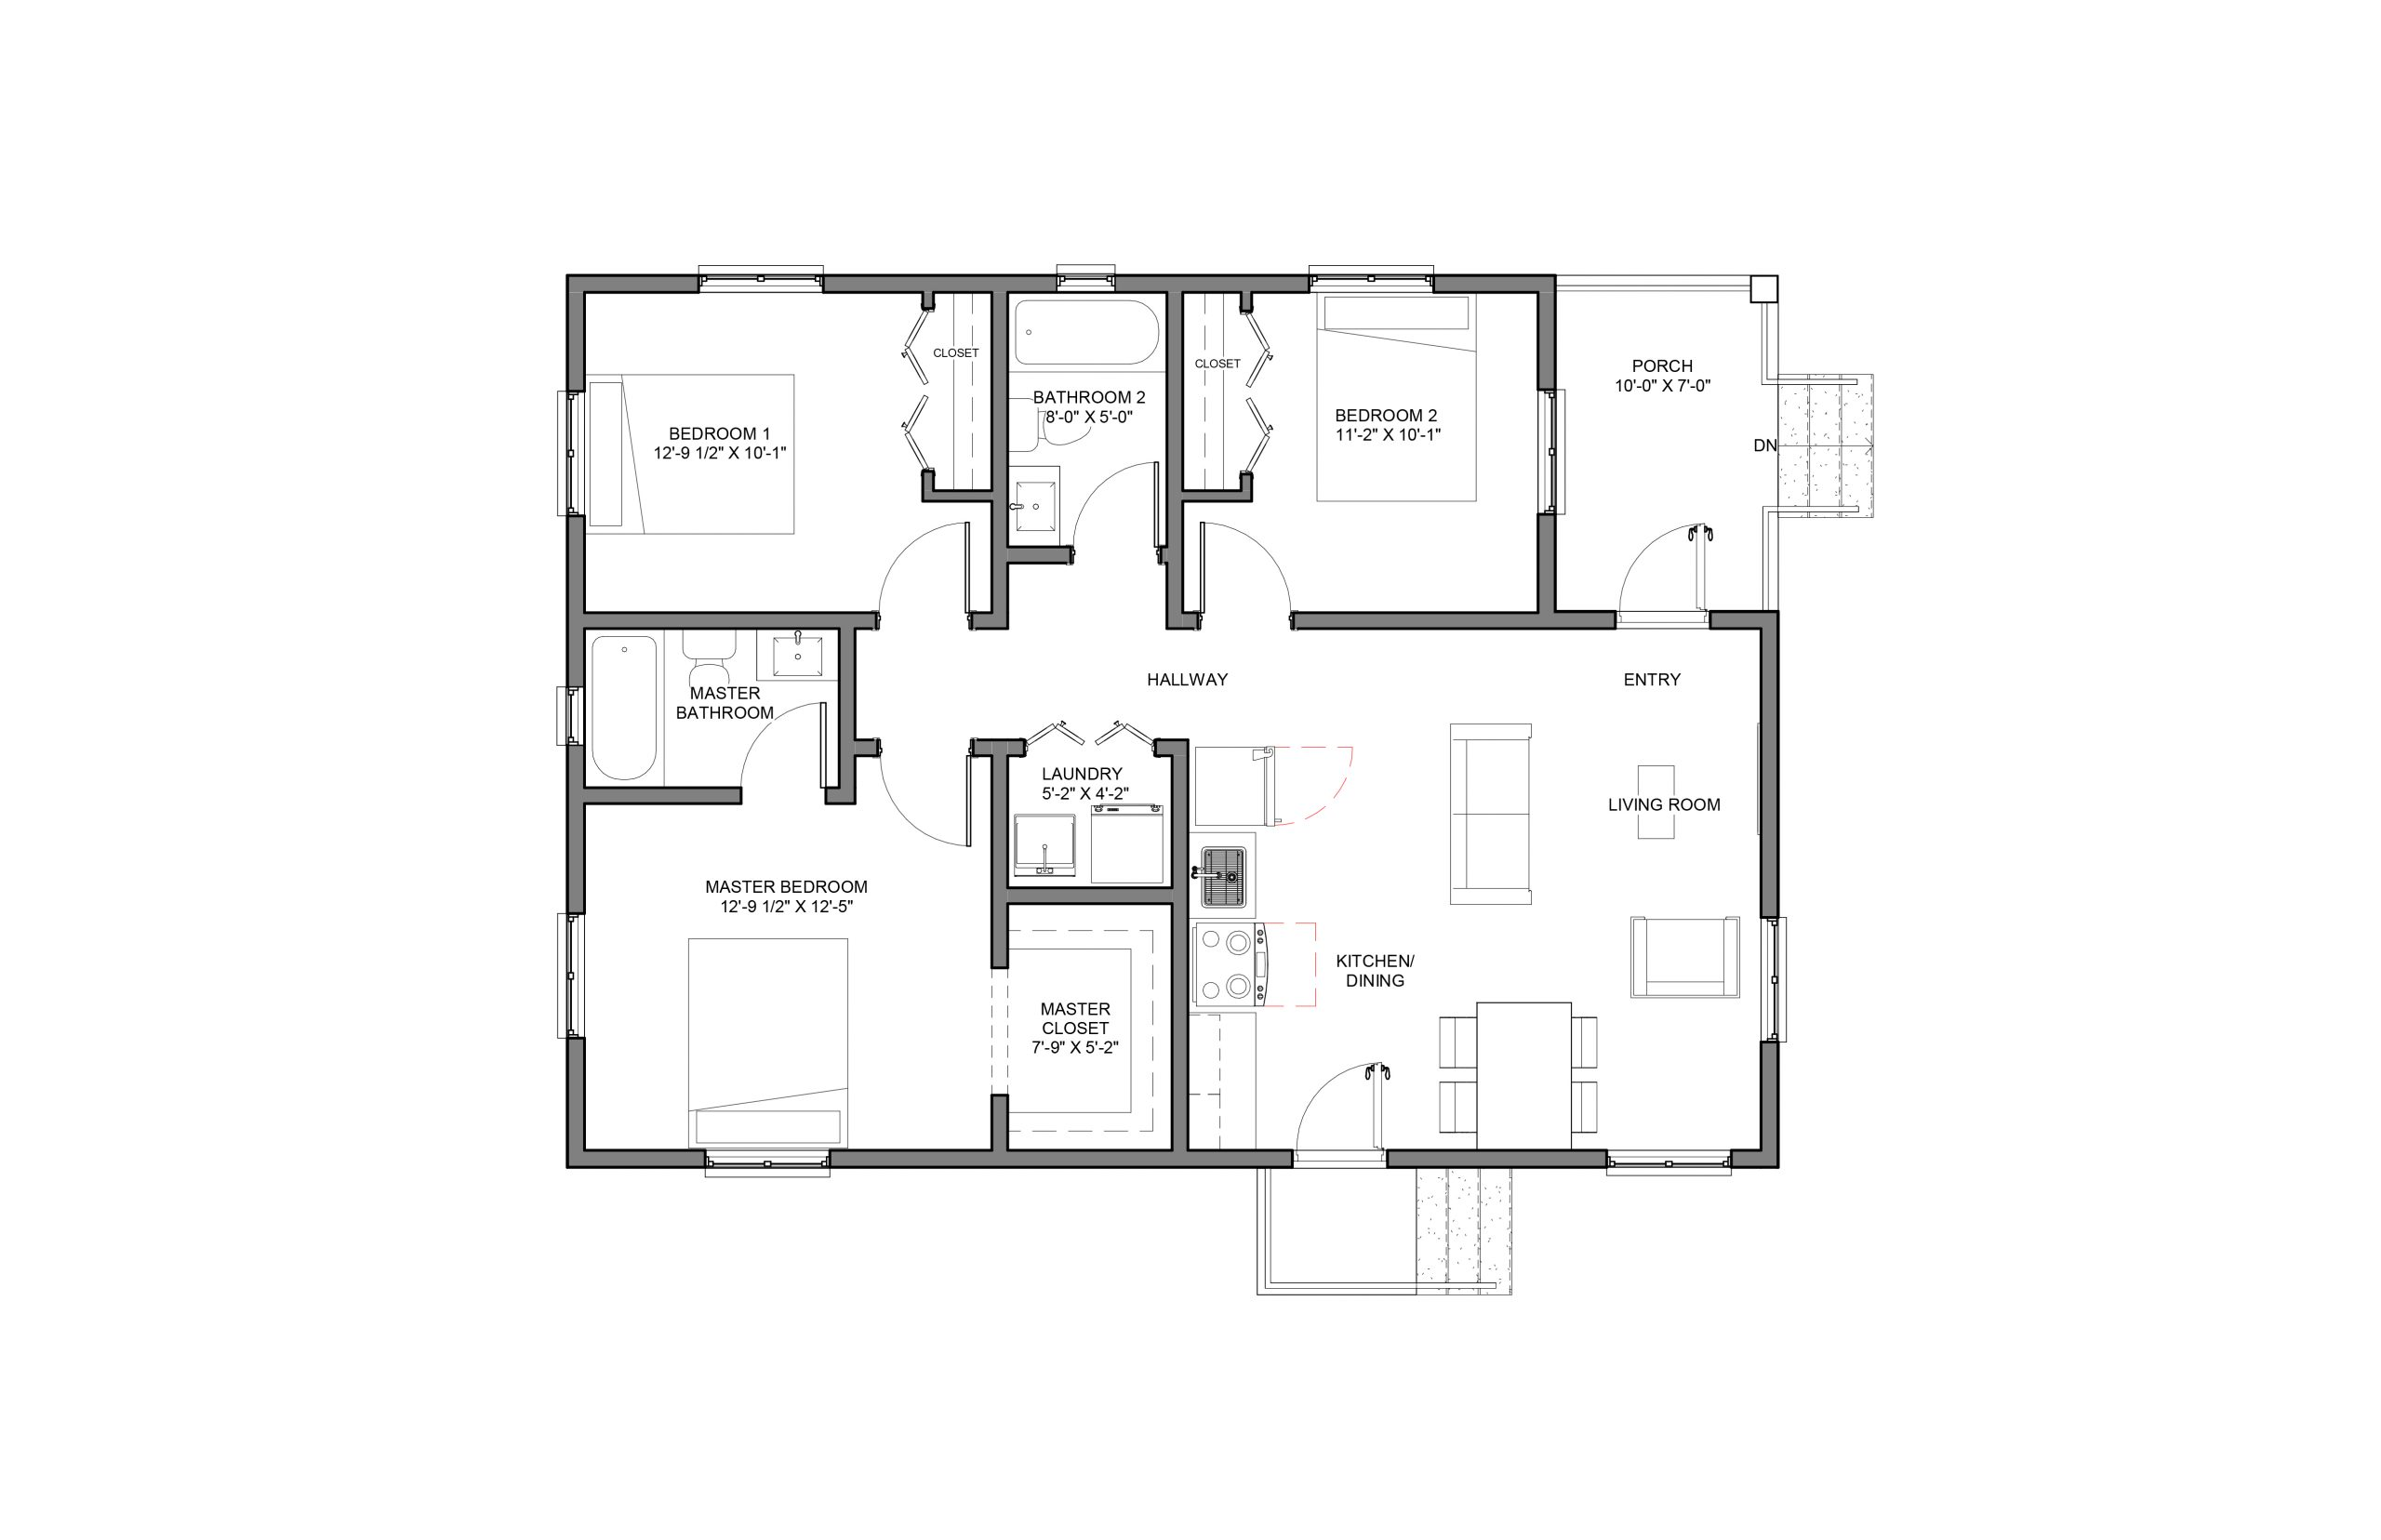 Lodestar 3Bed 2Bath Floor Plan Option 1 1060+SQFT